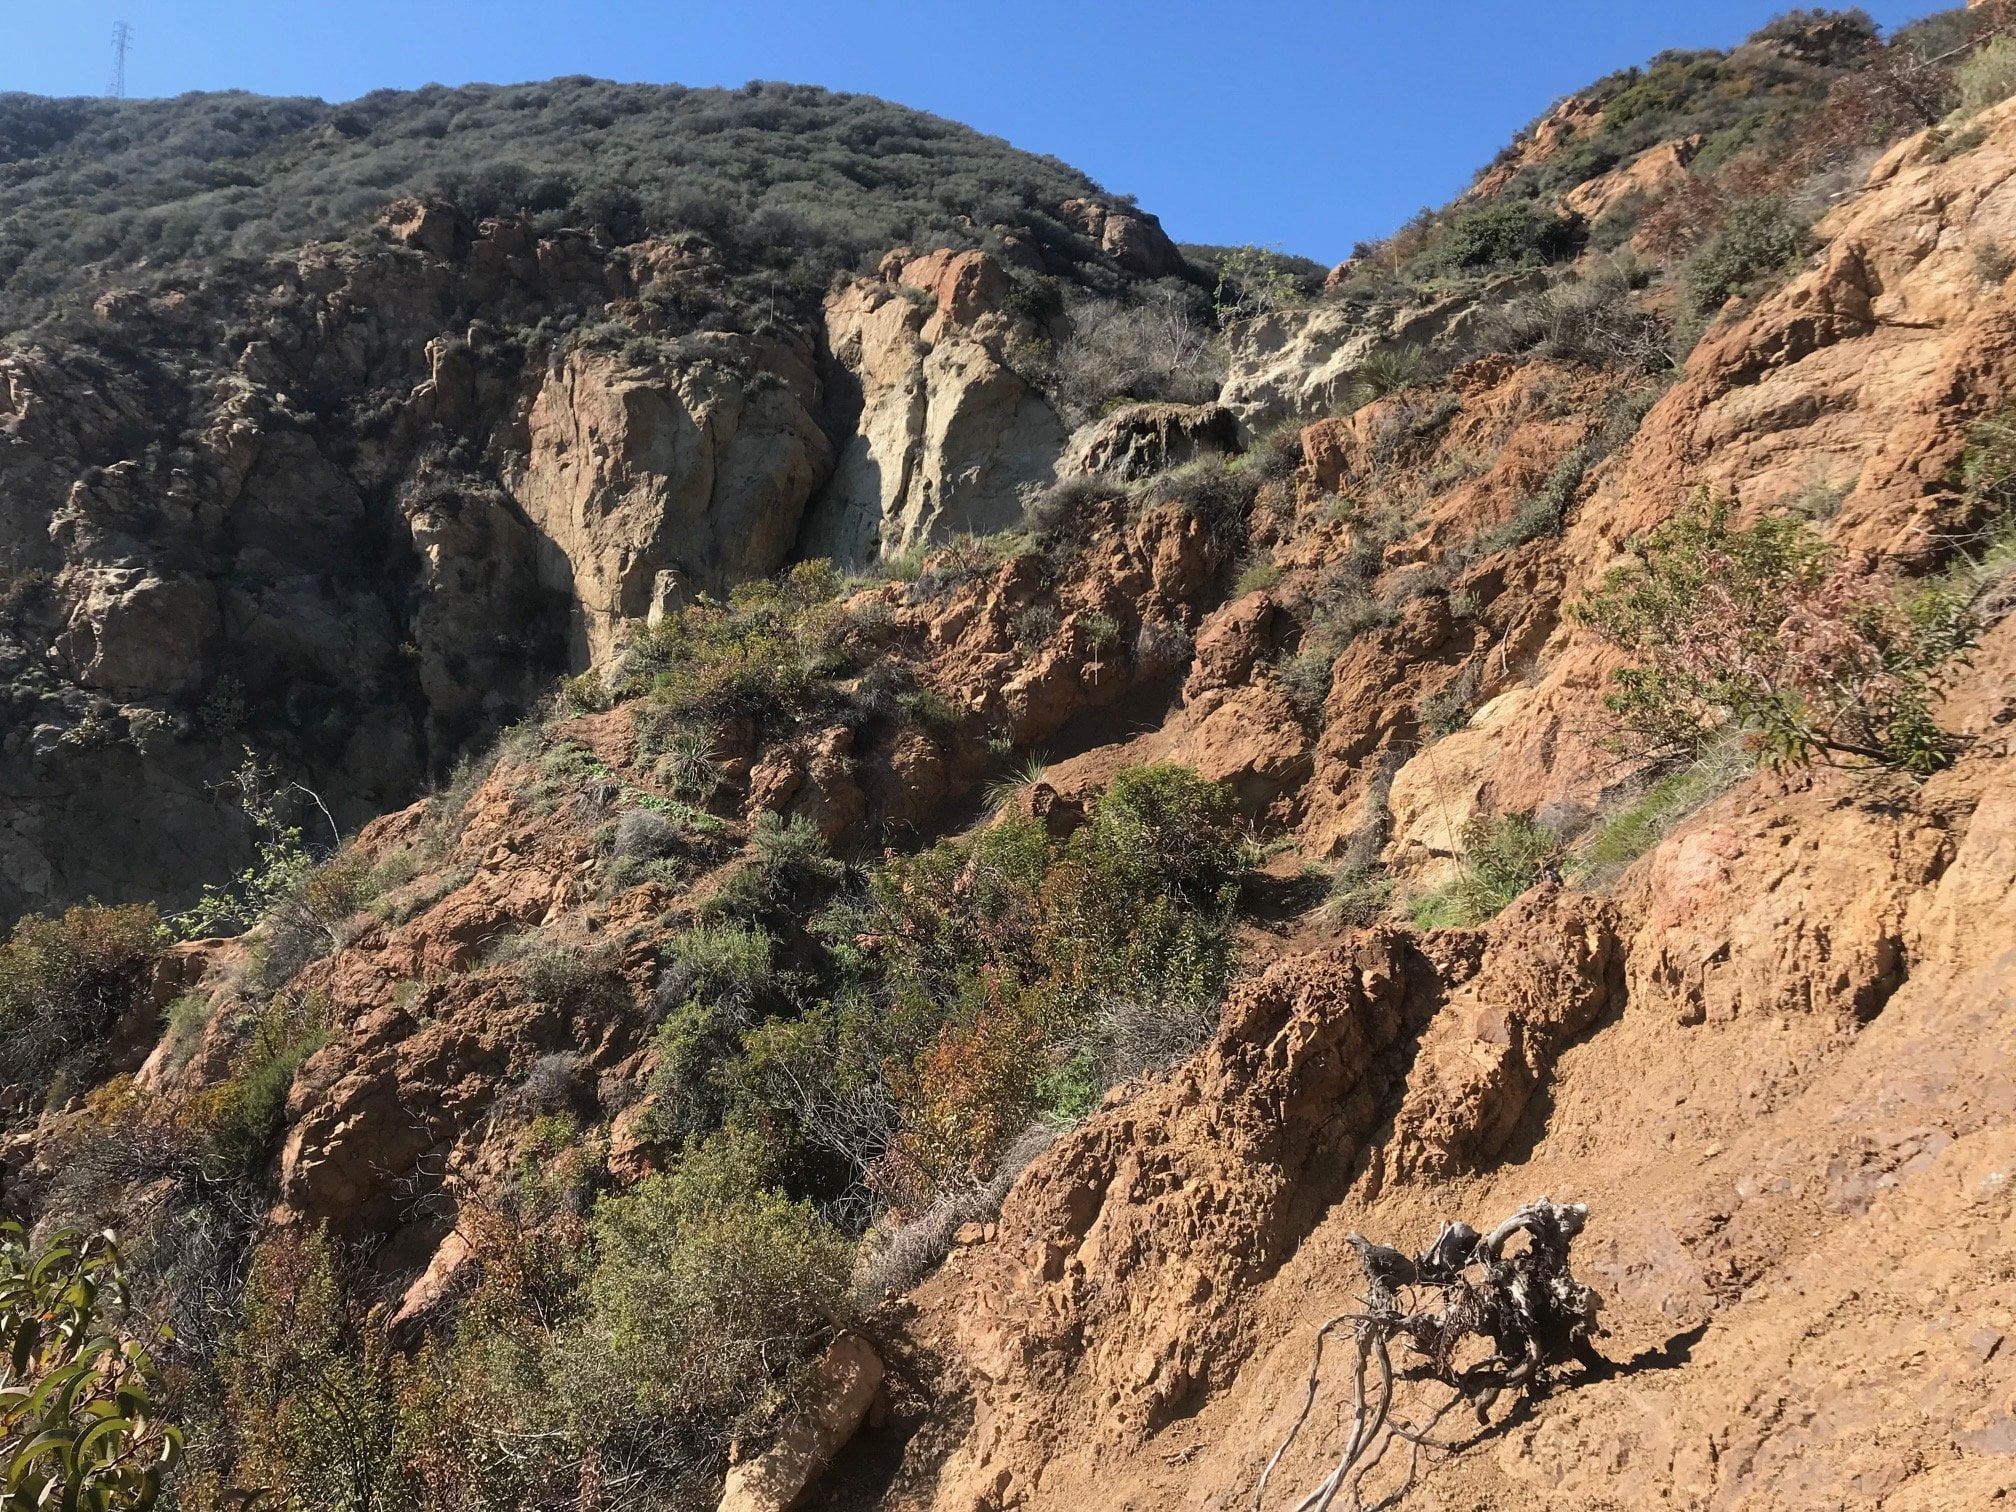 Escondido Falls canyon trail